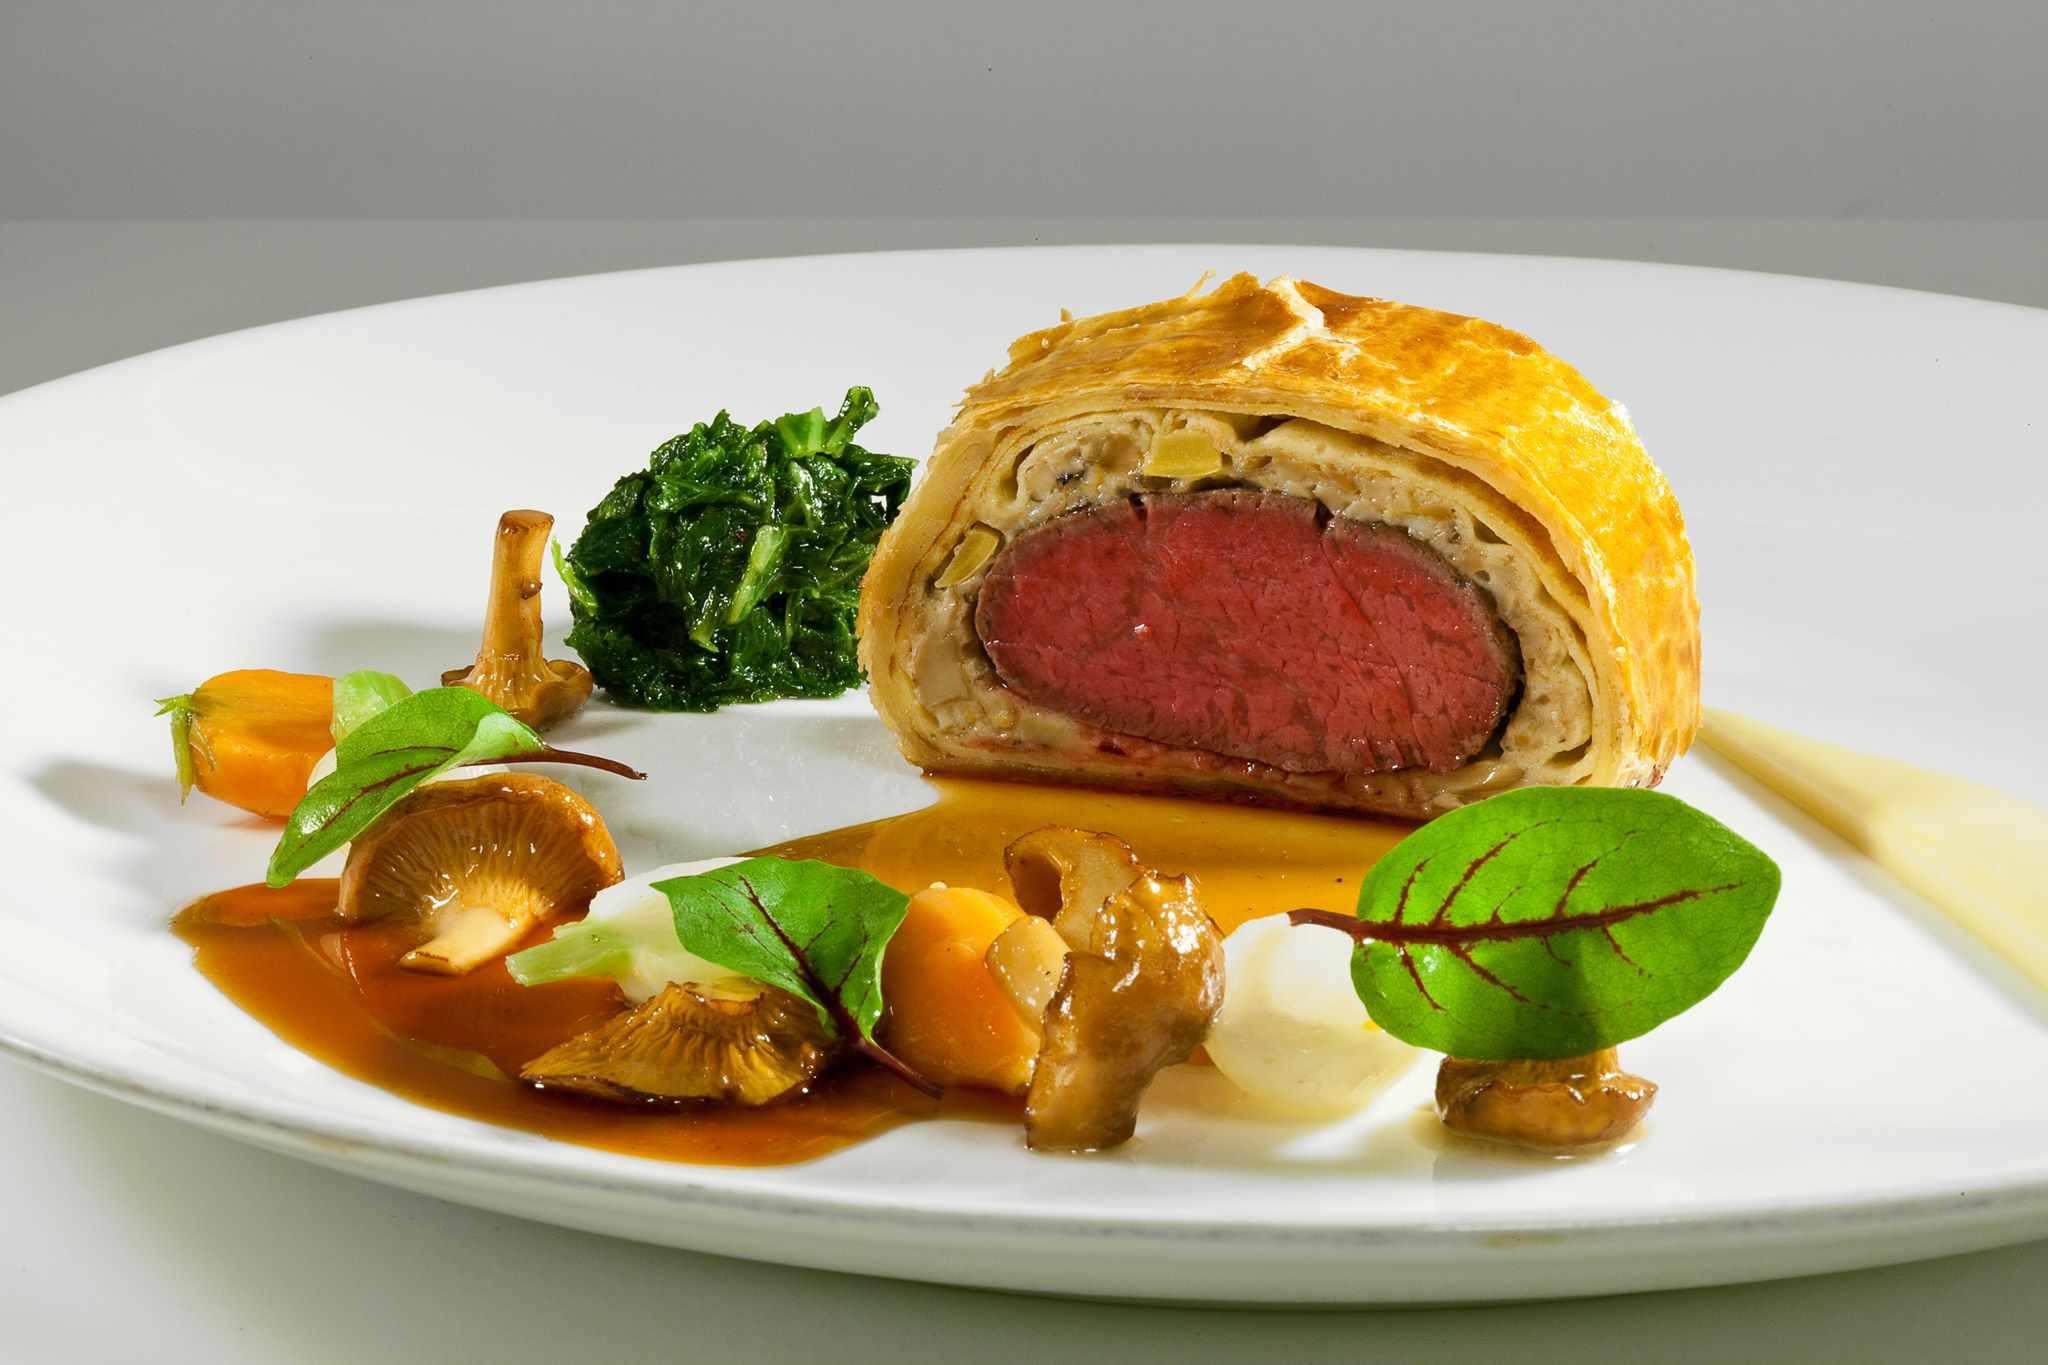 Meat and mushroom dish